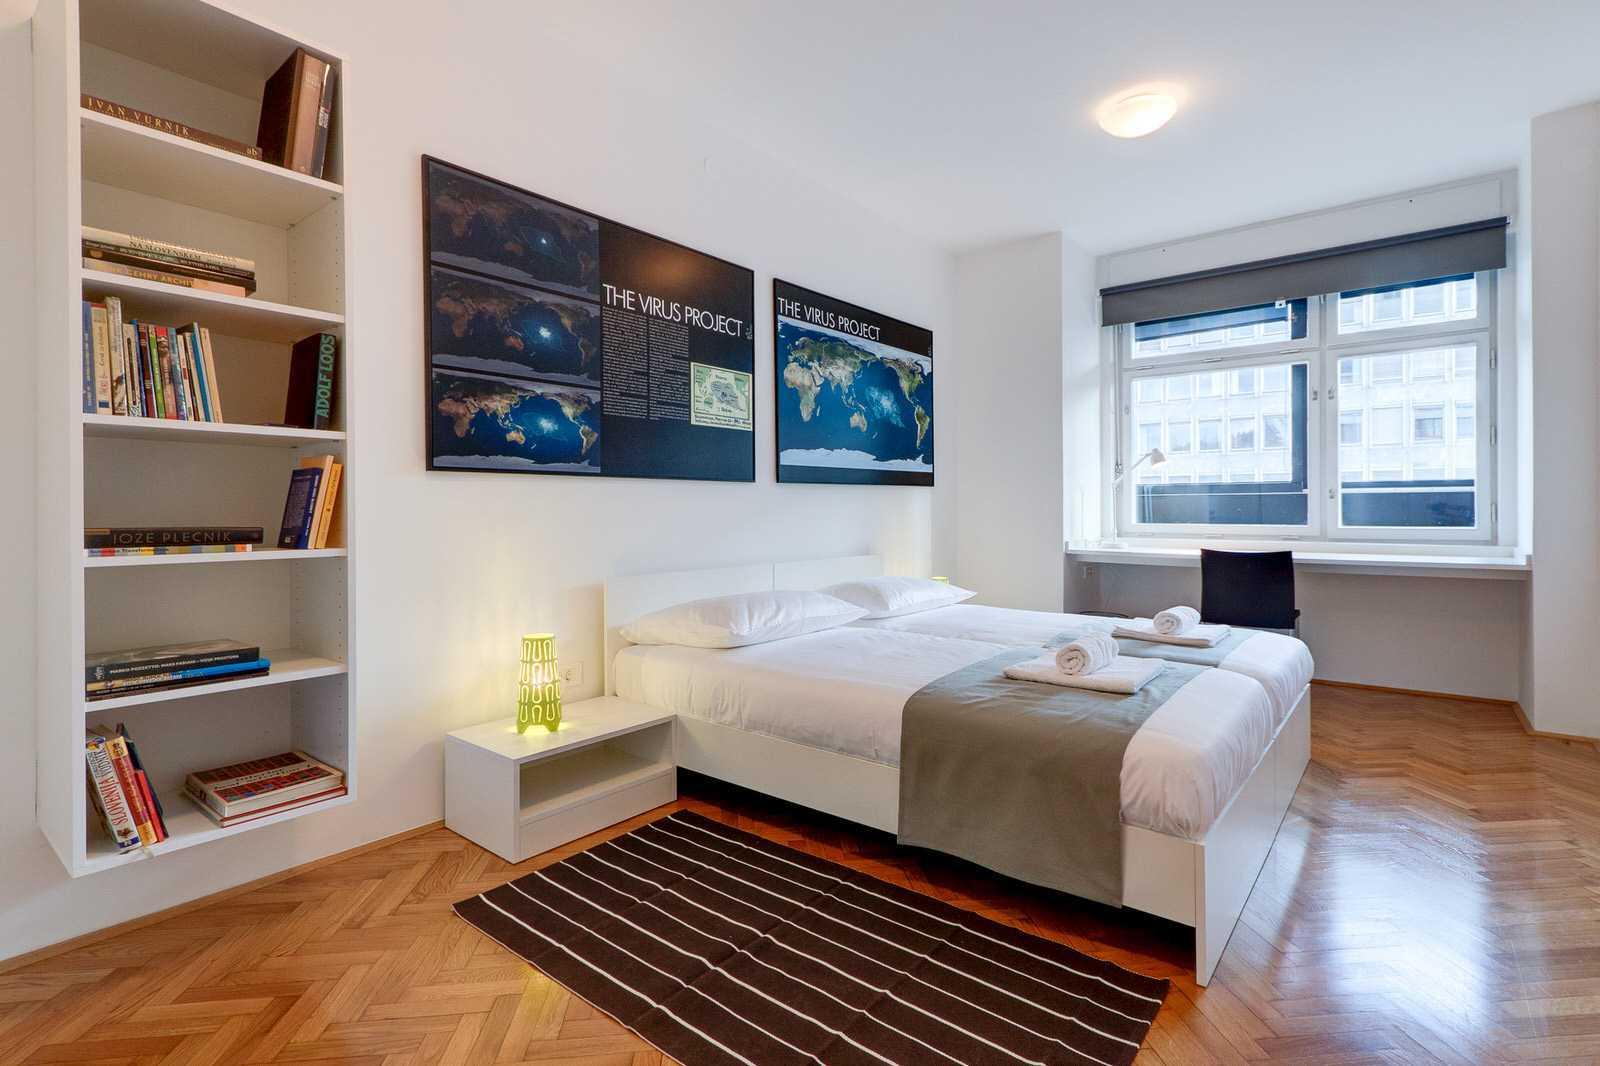 Bedroom no.1 in the 2-bedroom rental apartment Slovenska street.